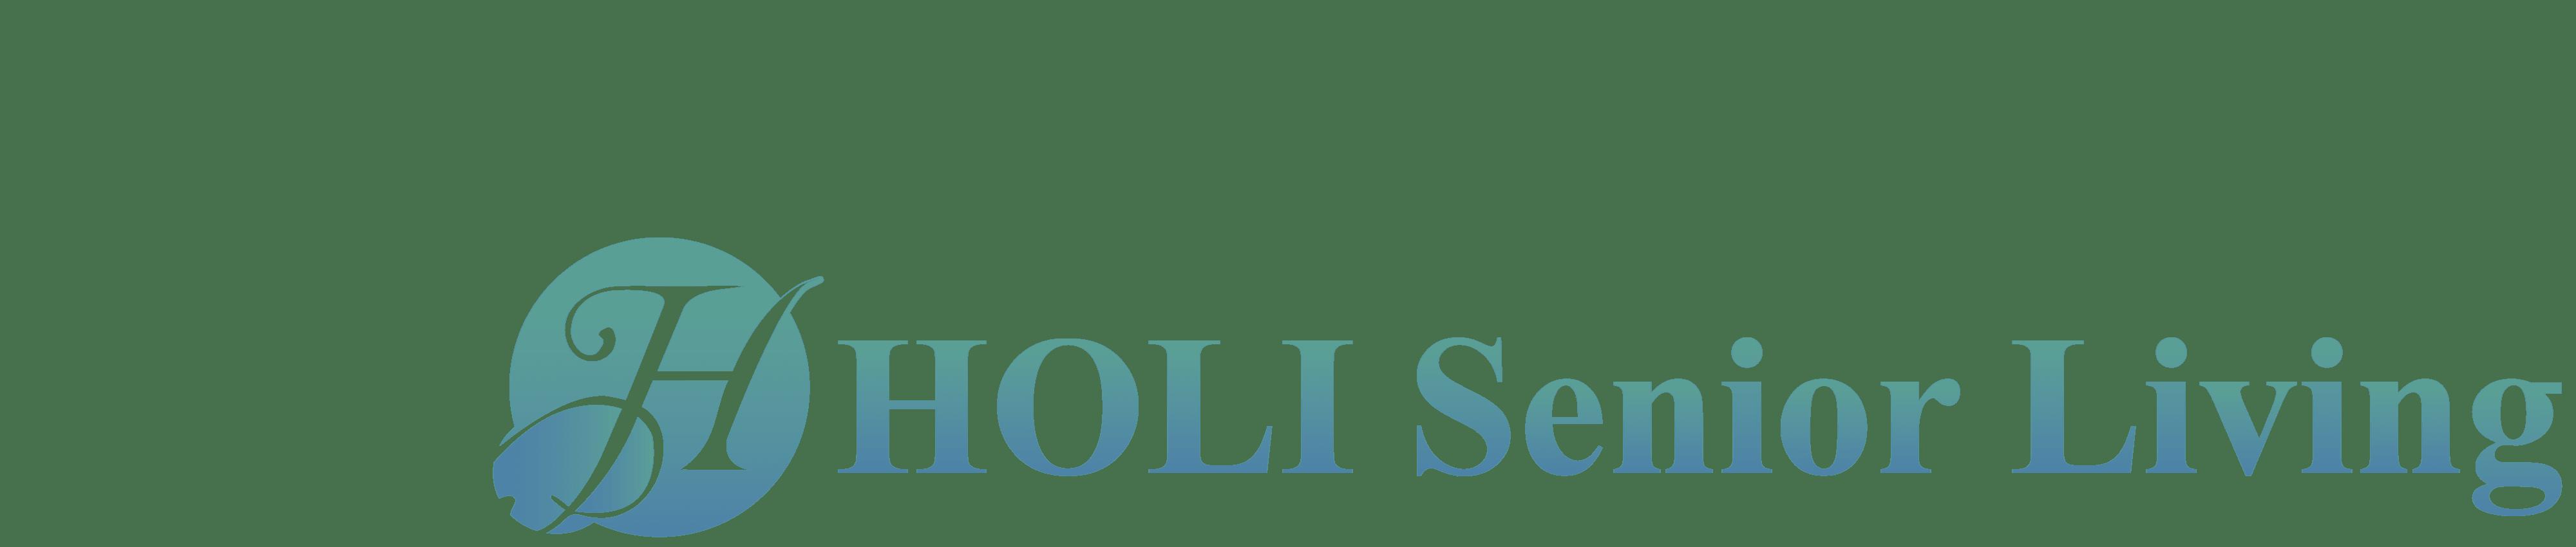 HOLI Senior Living